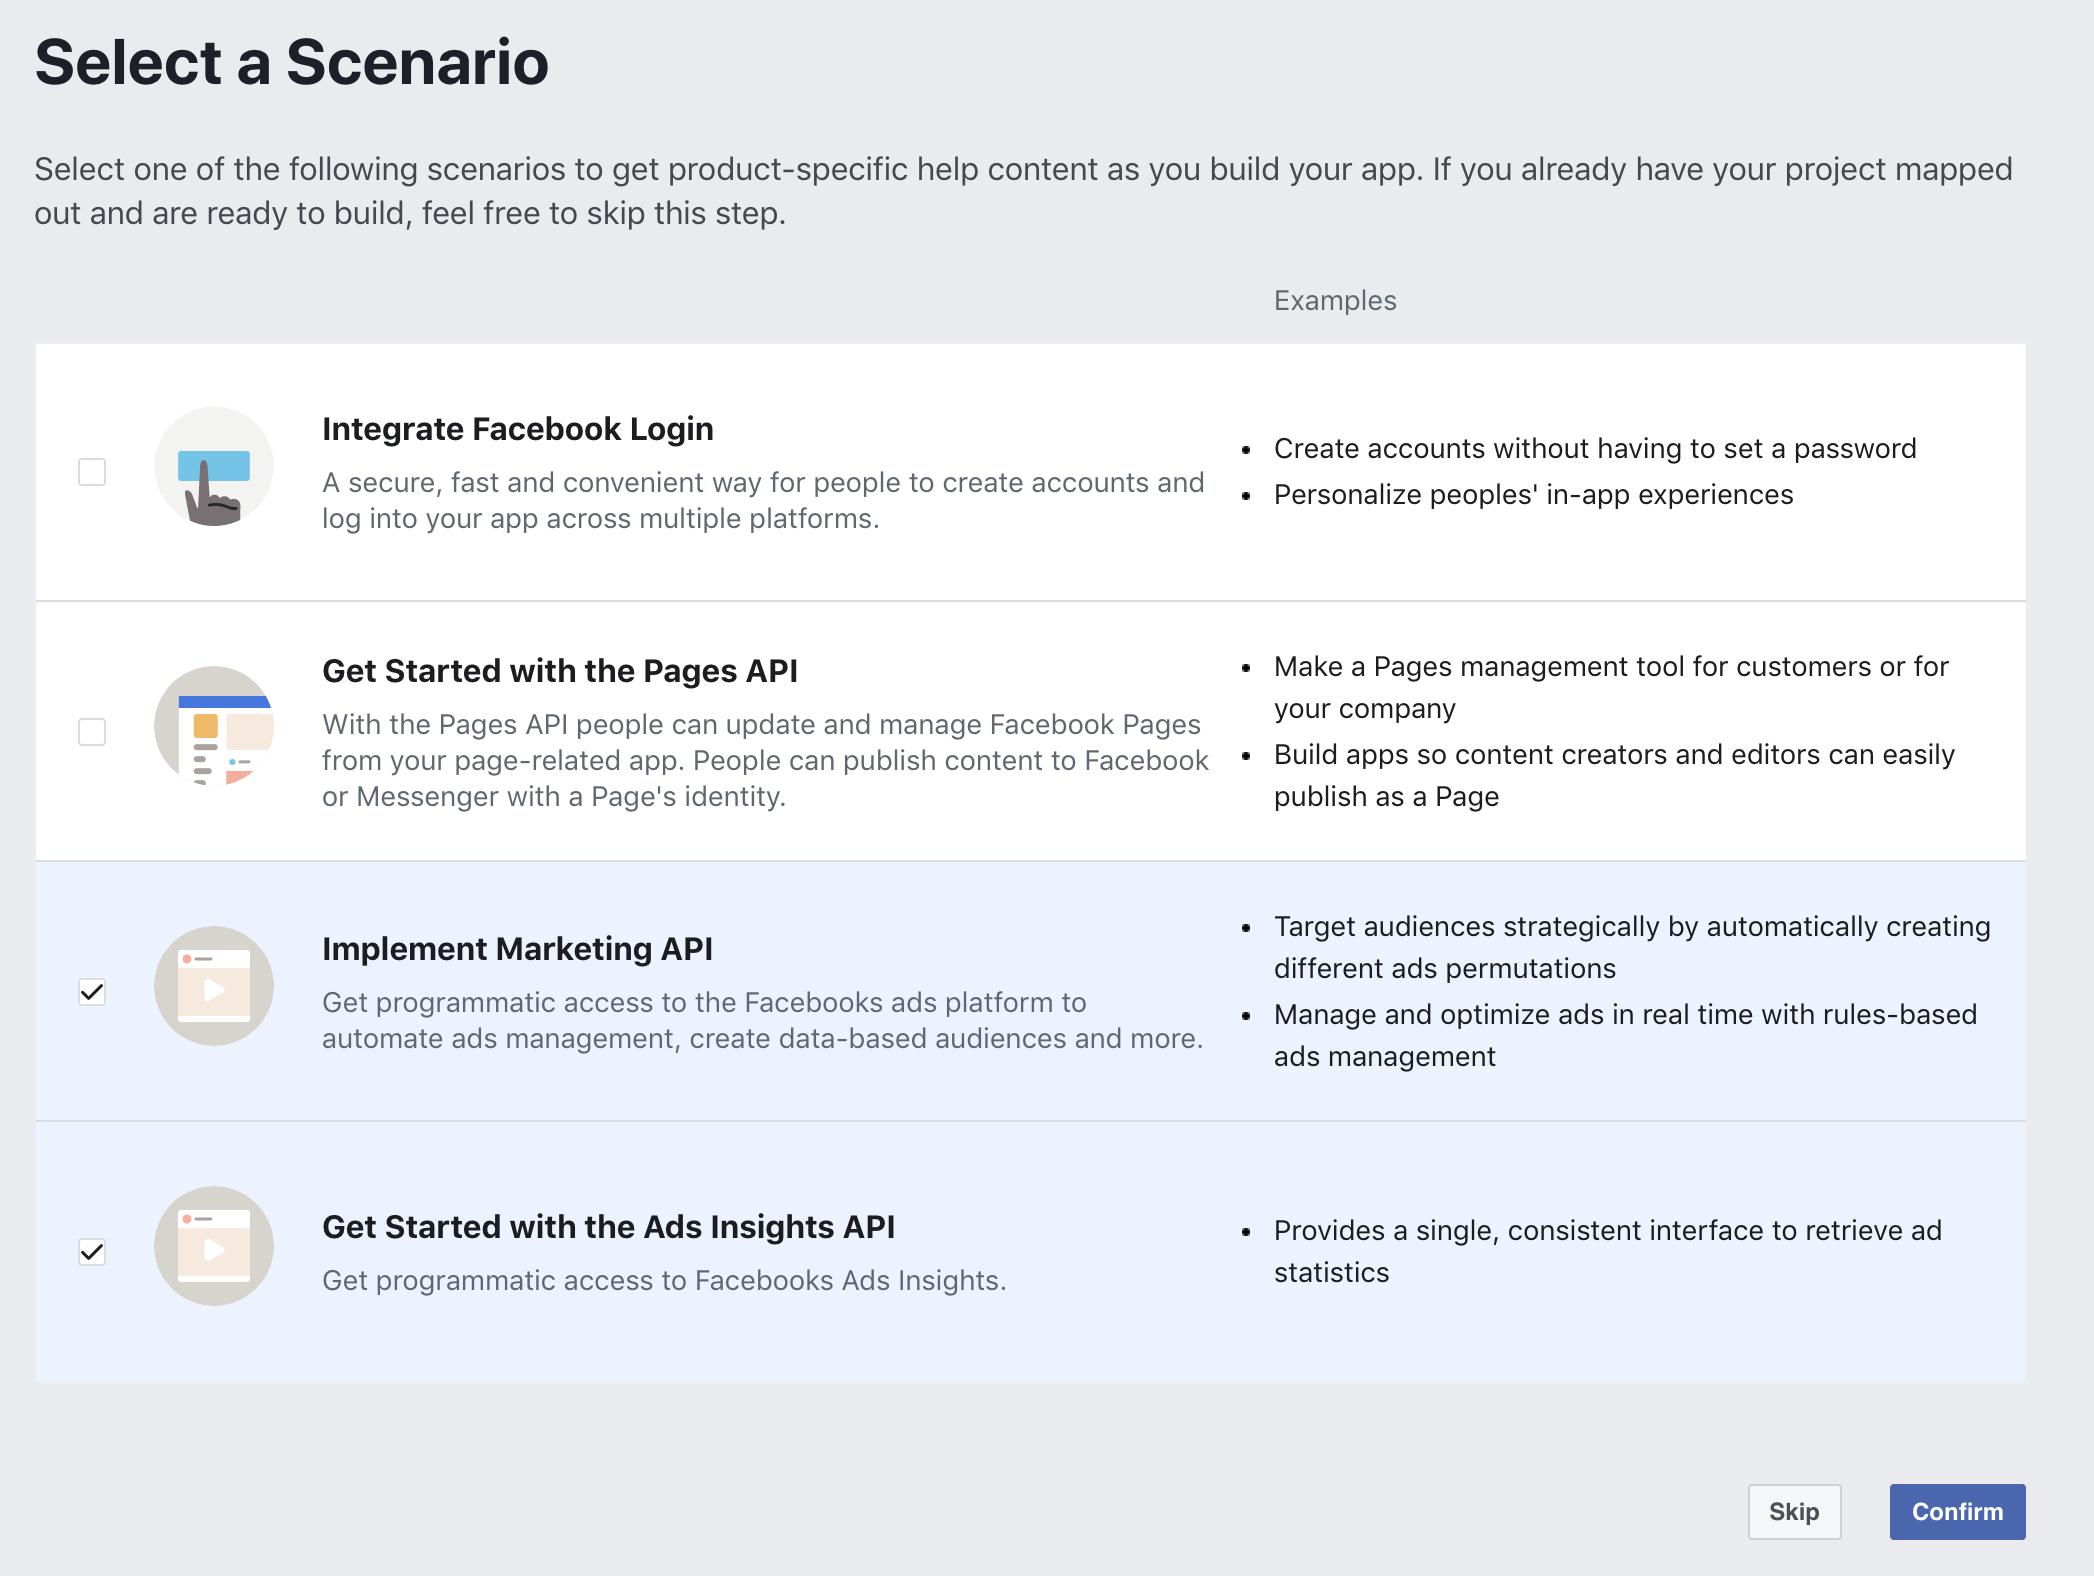 facebook new app scenario interface